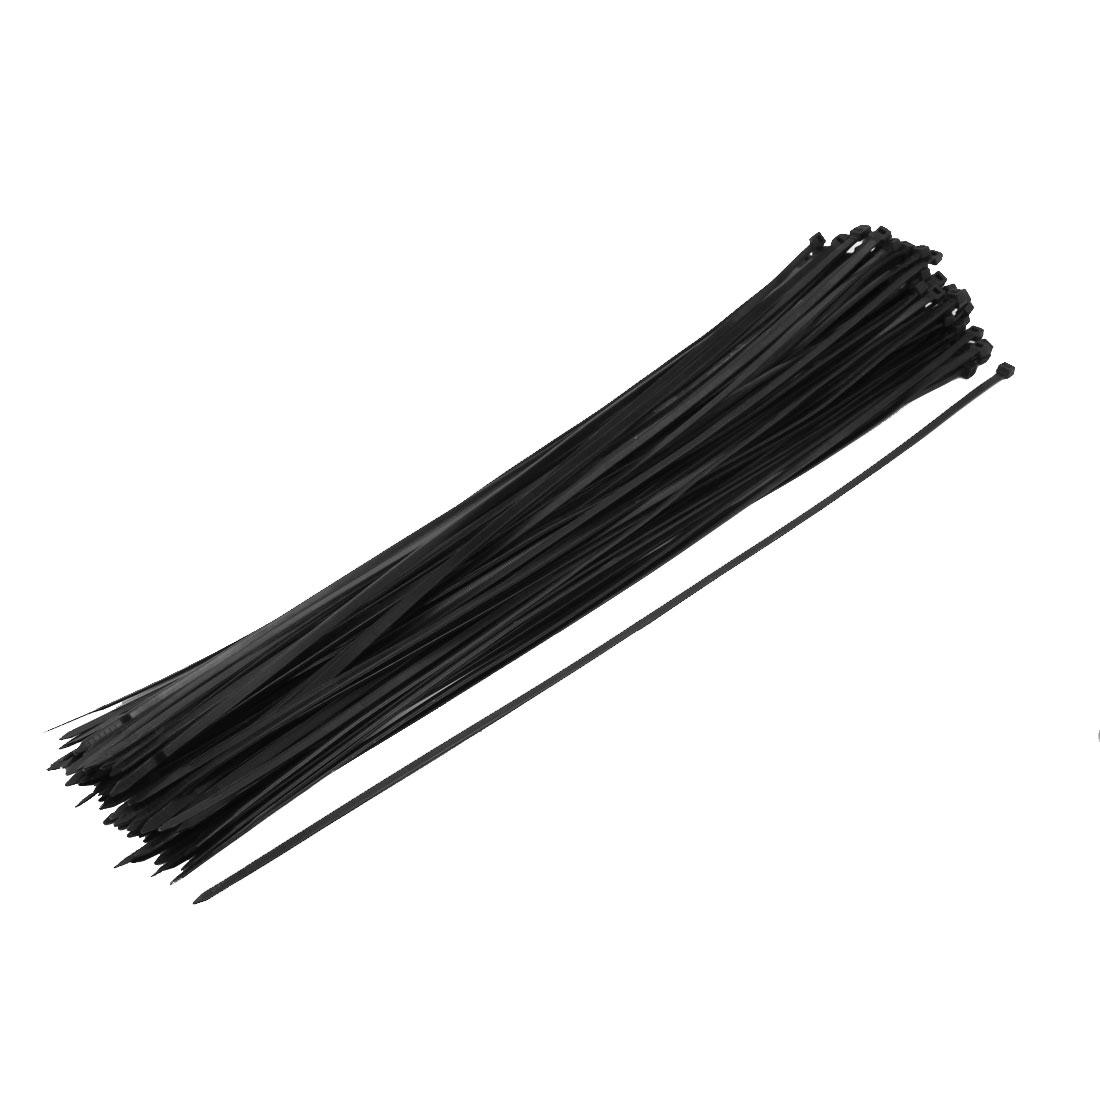 5mm x 500mm Nylon Self Locking Cable Zip Ties Fastener Black 100pcs